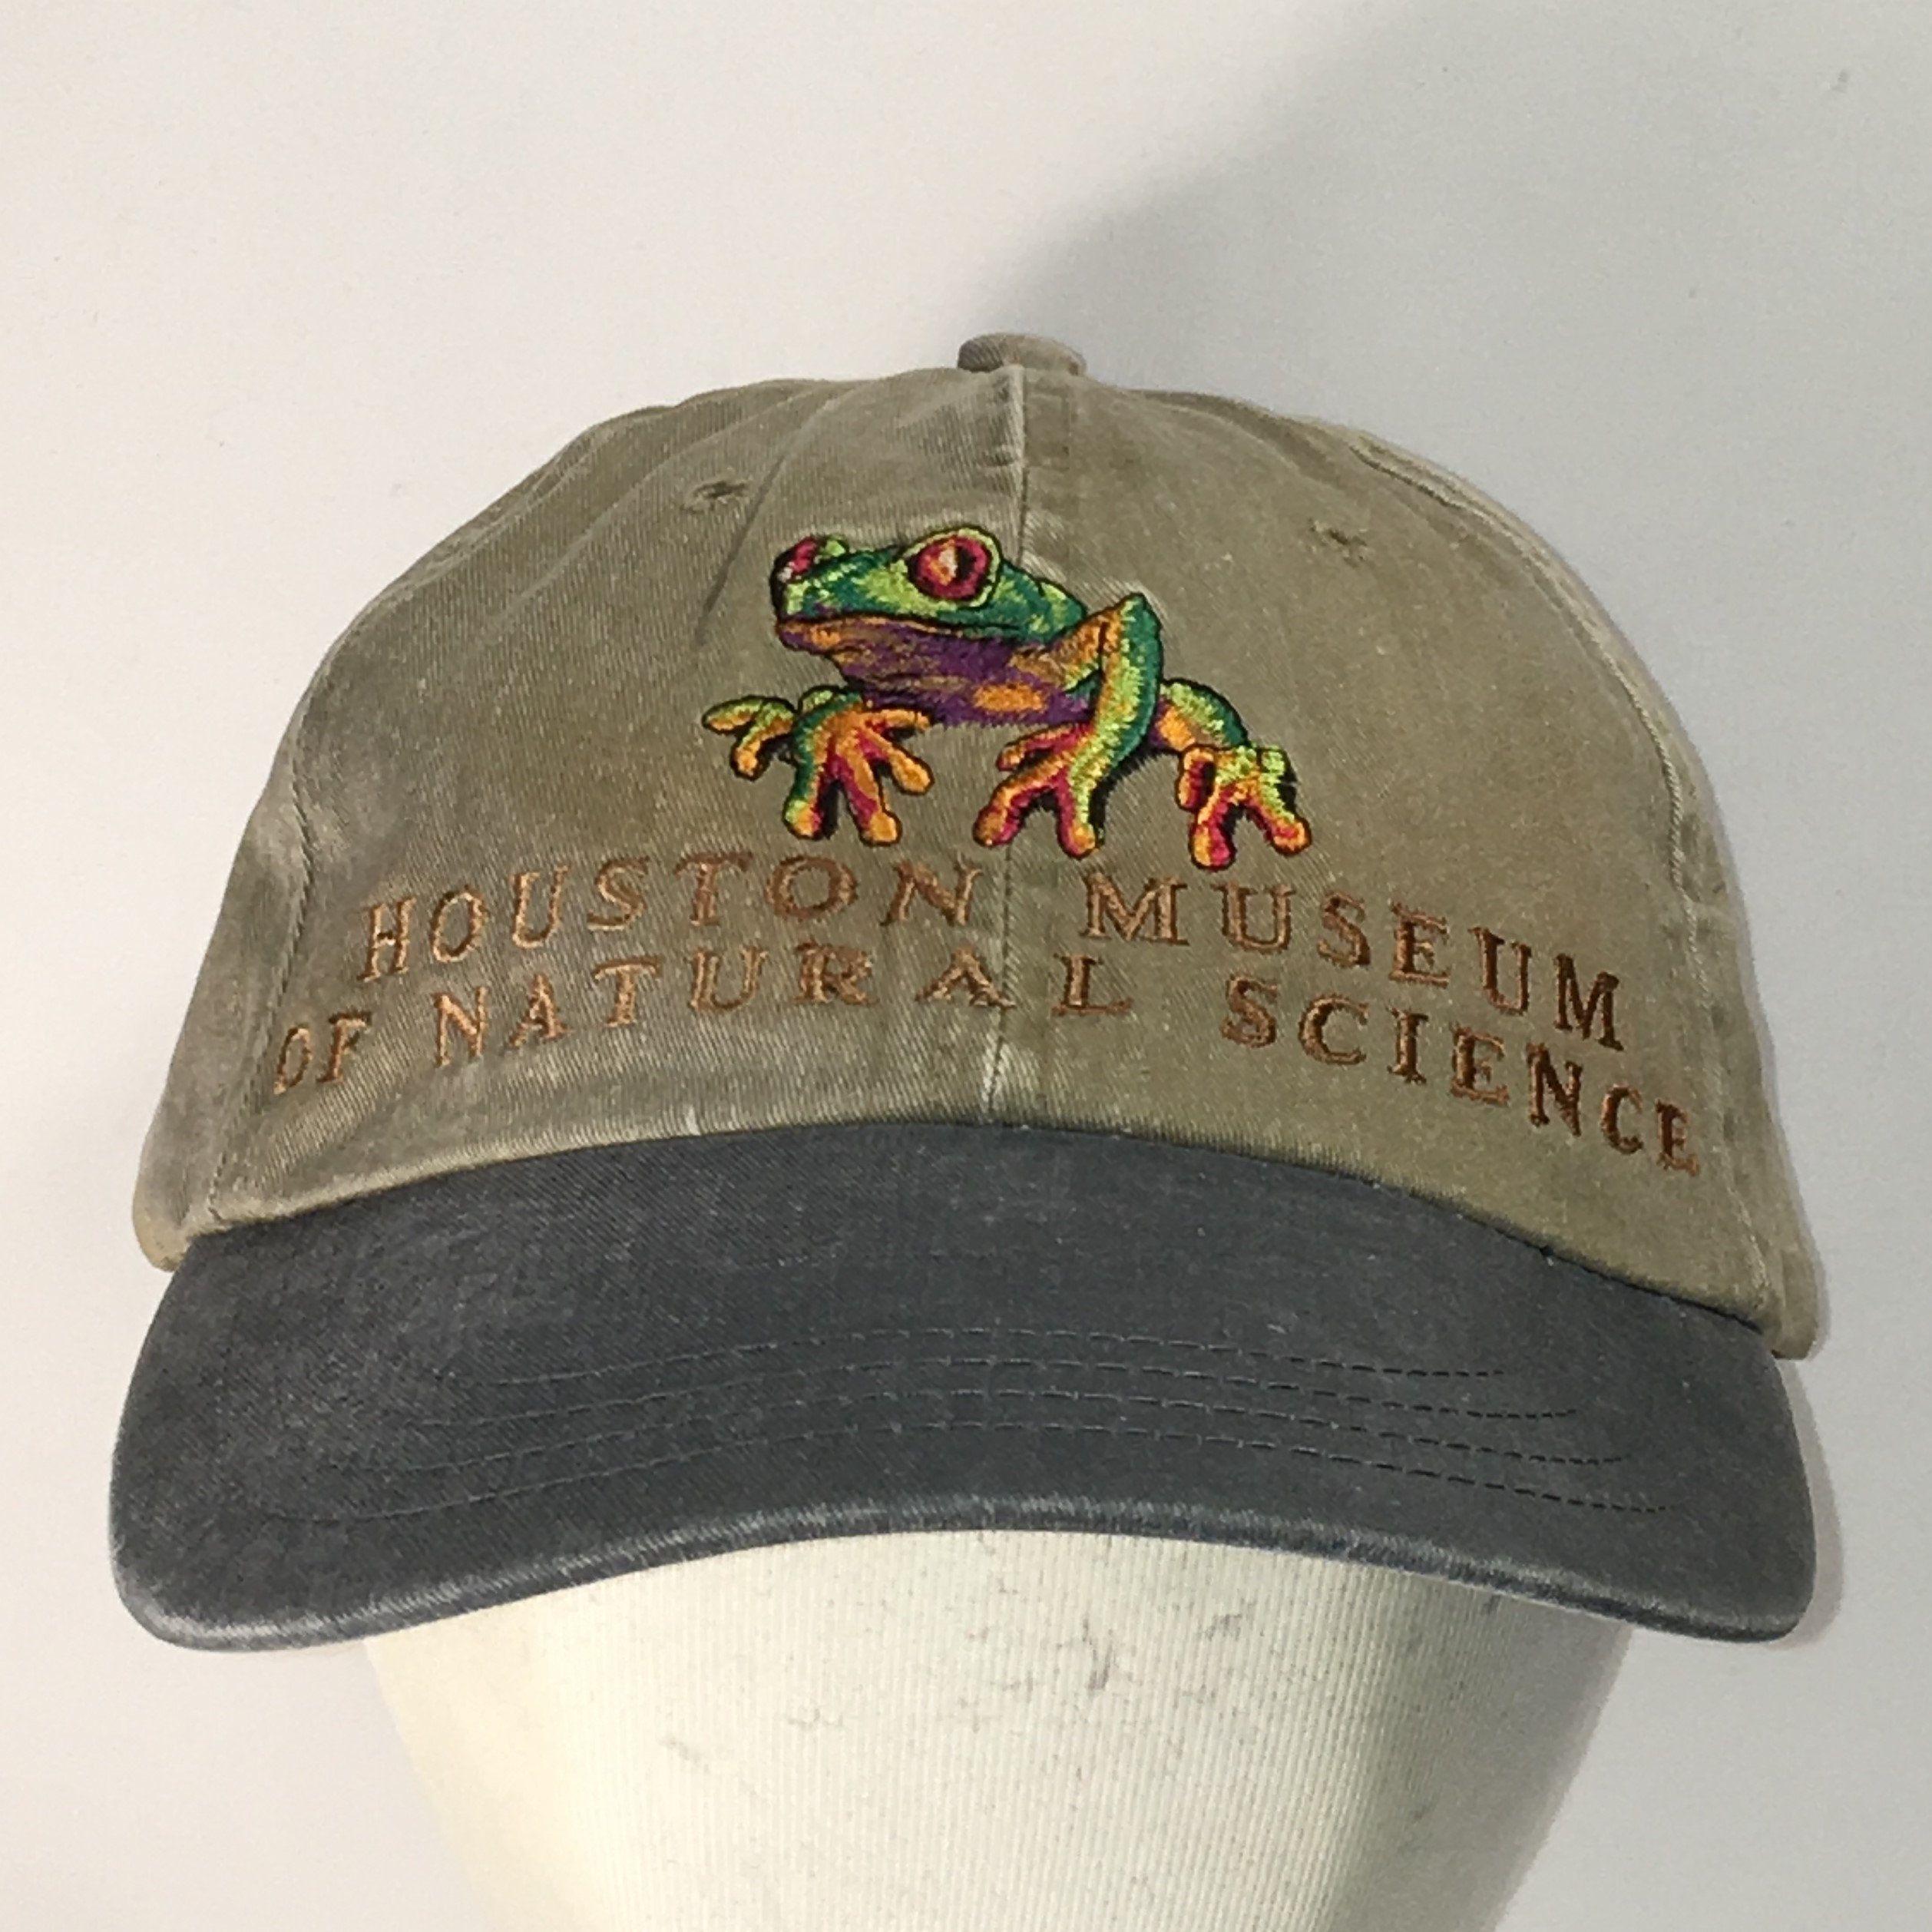 1f458087c3787 Houston Museum of Natural Science Baseball Cap Colorful Frog Hats For Men  Strapback Dad Hat Khaki Beige Gray Vintage Mens Caps T16 A9023  Frog   FrogHat ...